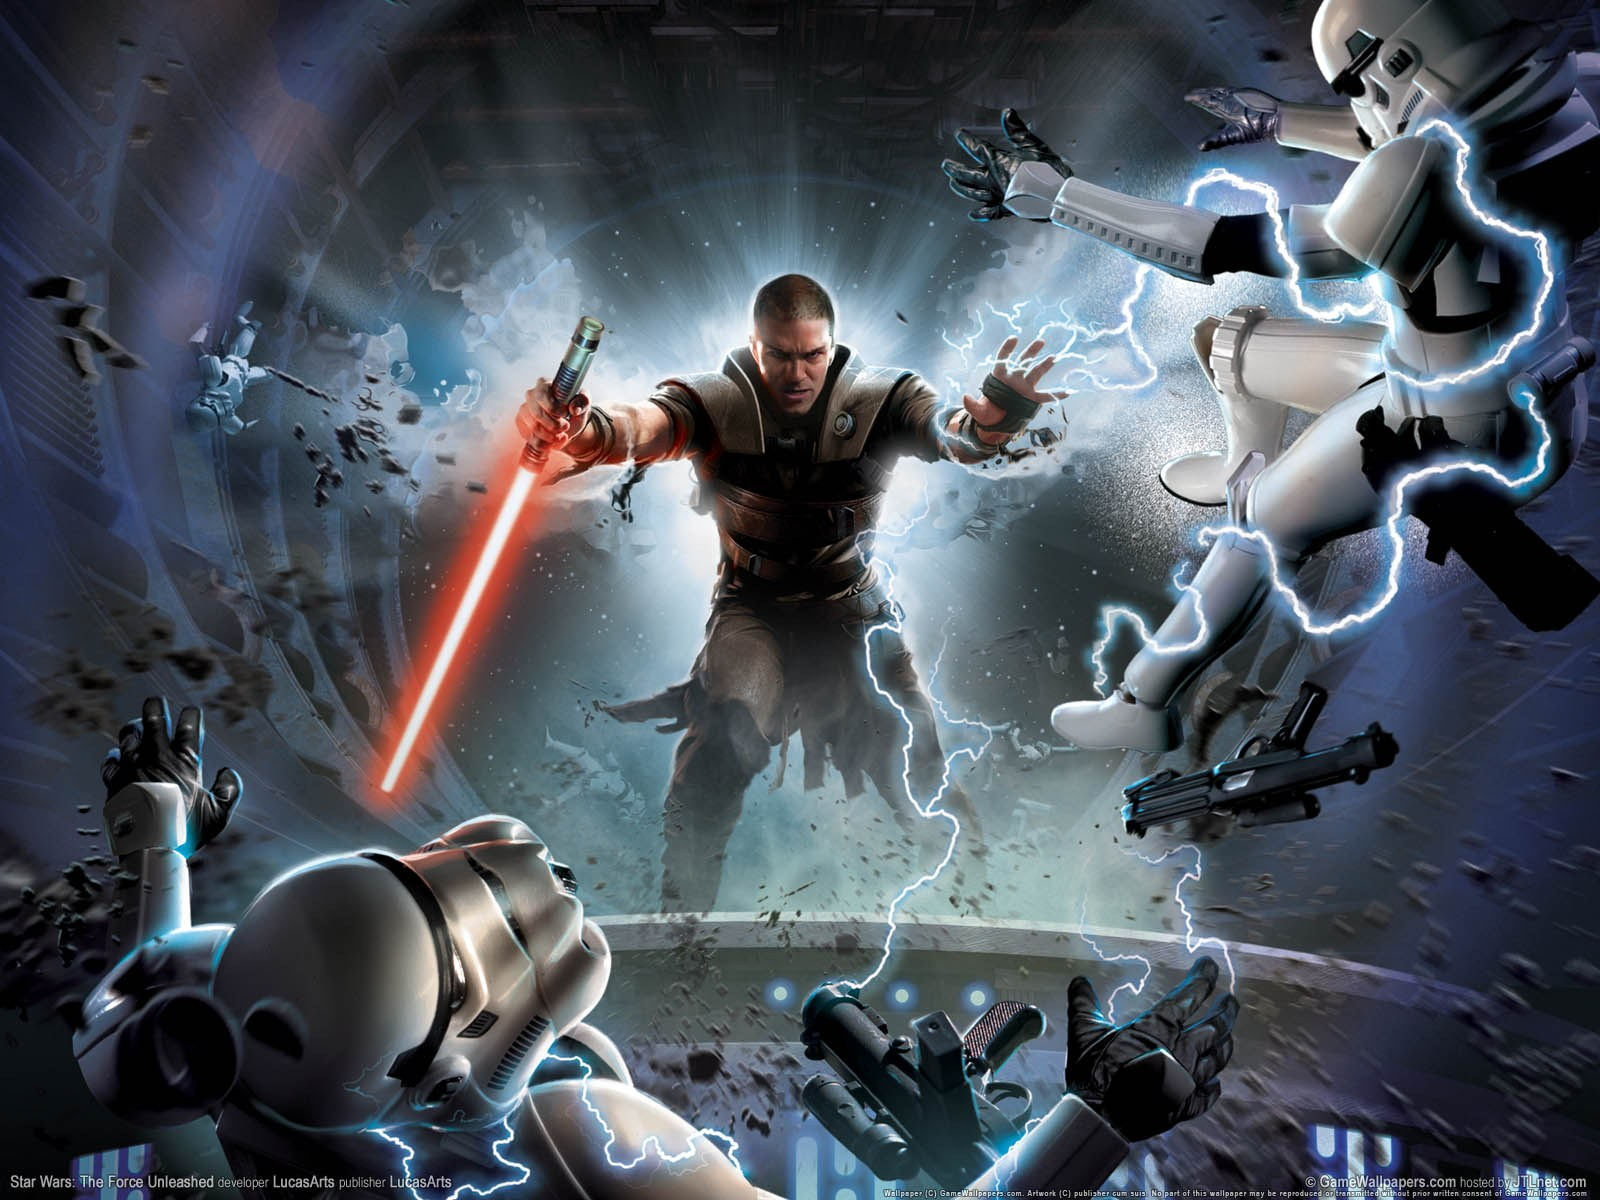 Fondos De Pantalla De Star Wars Hd Imágenes En Taringa